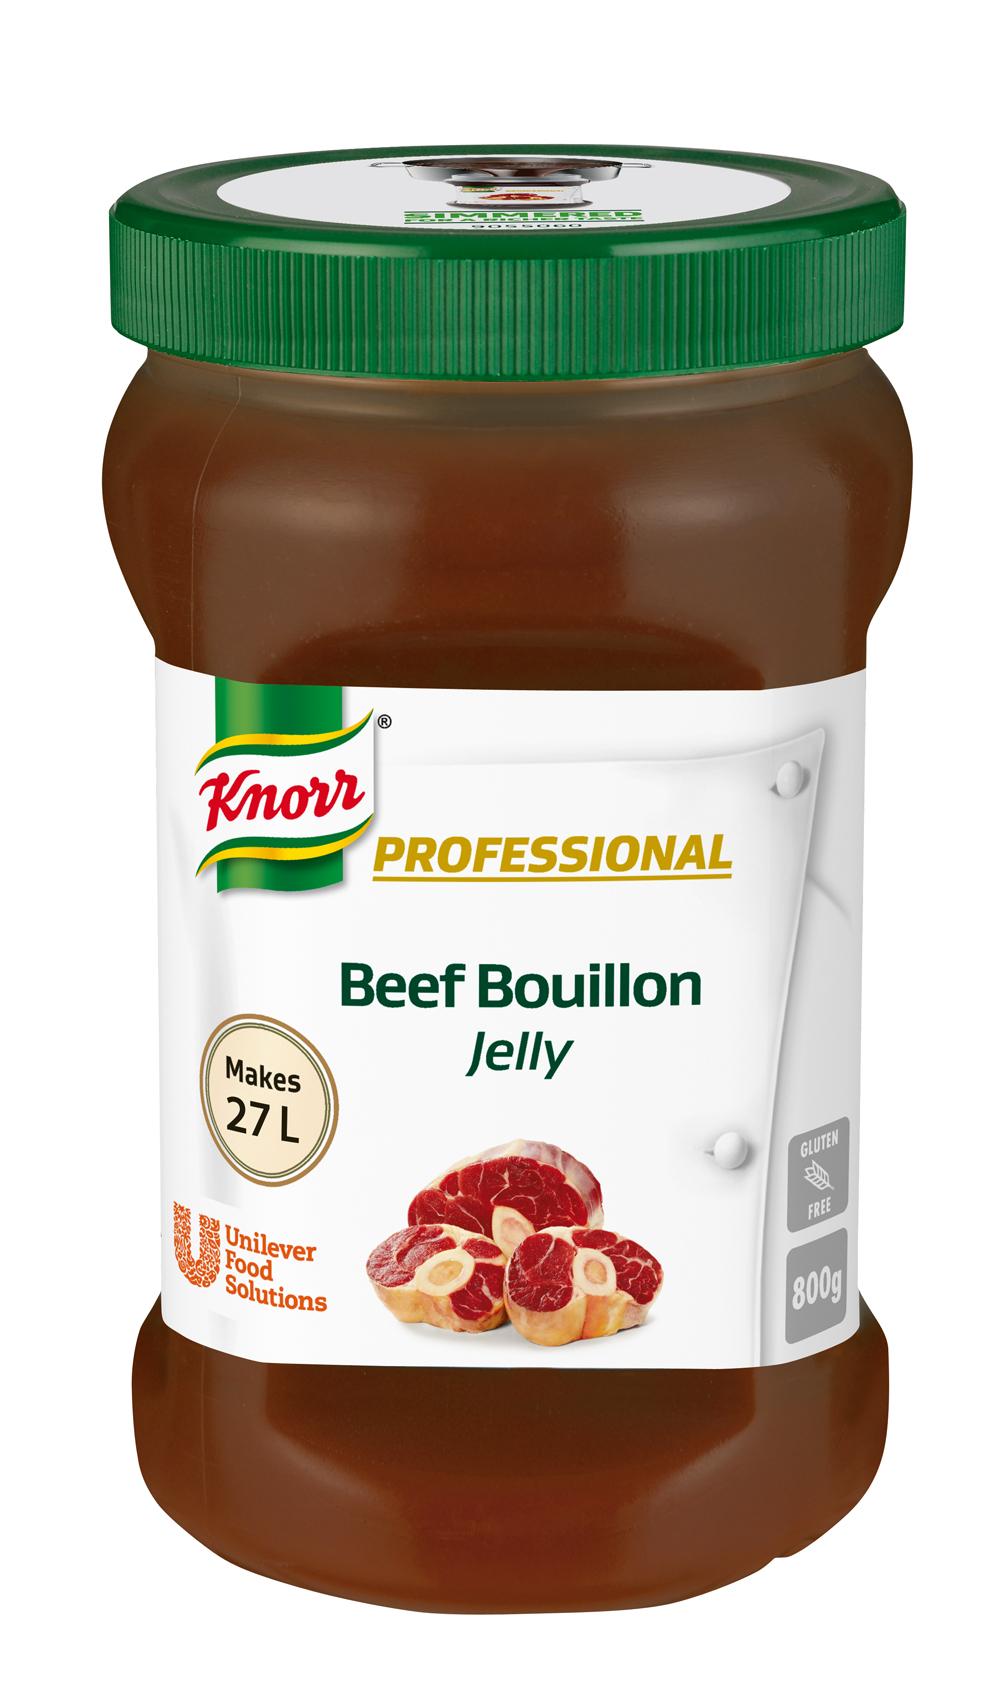 Knorr желиран телешки бульон - Висококачествен концентриран телешки желиран бульон